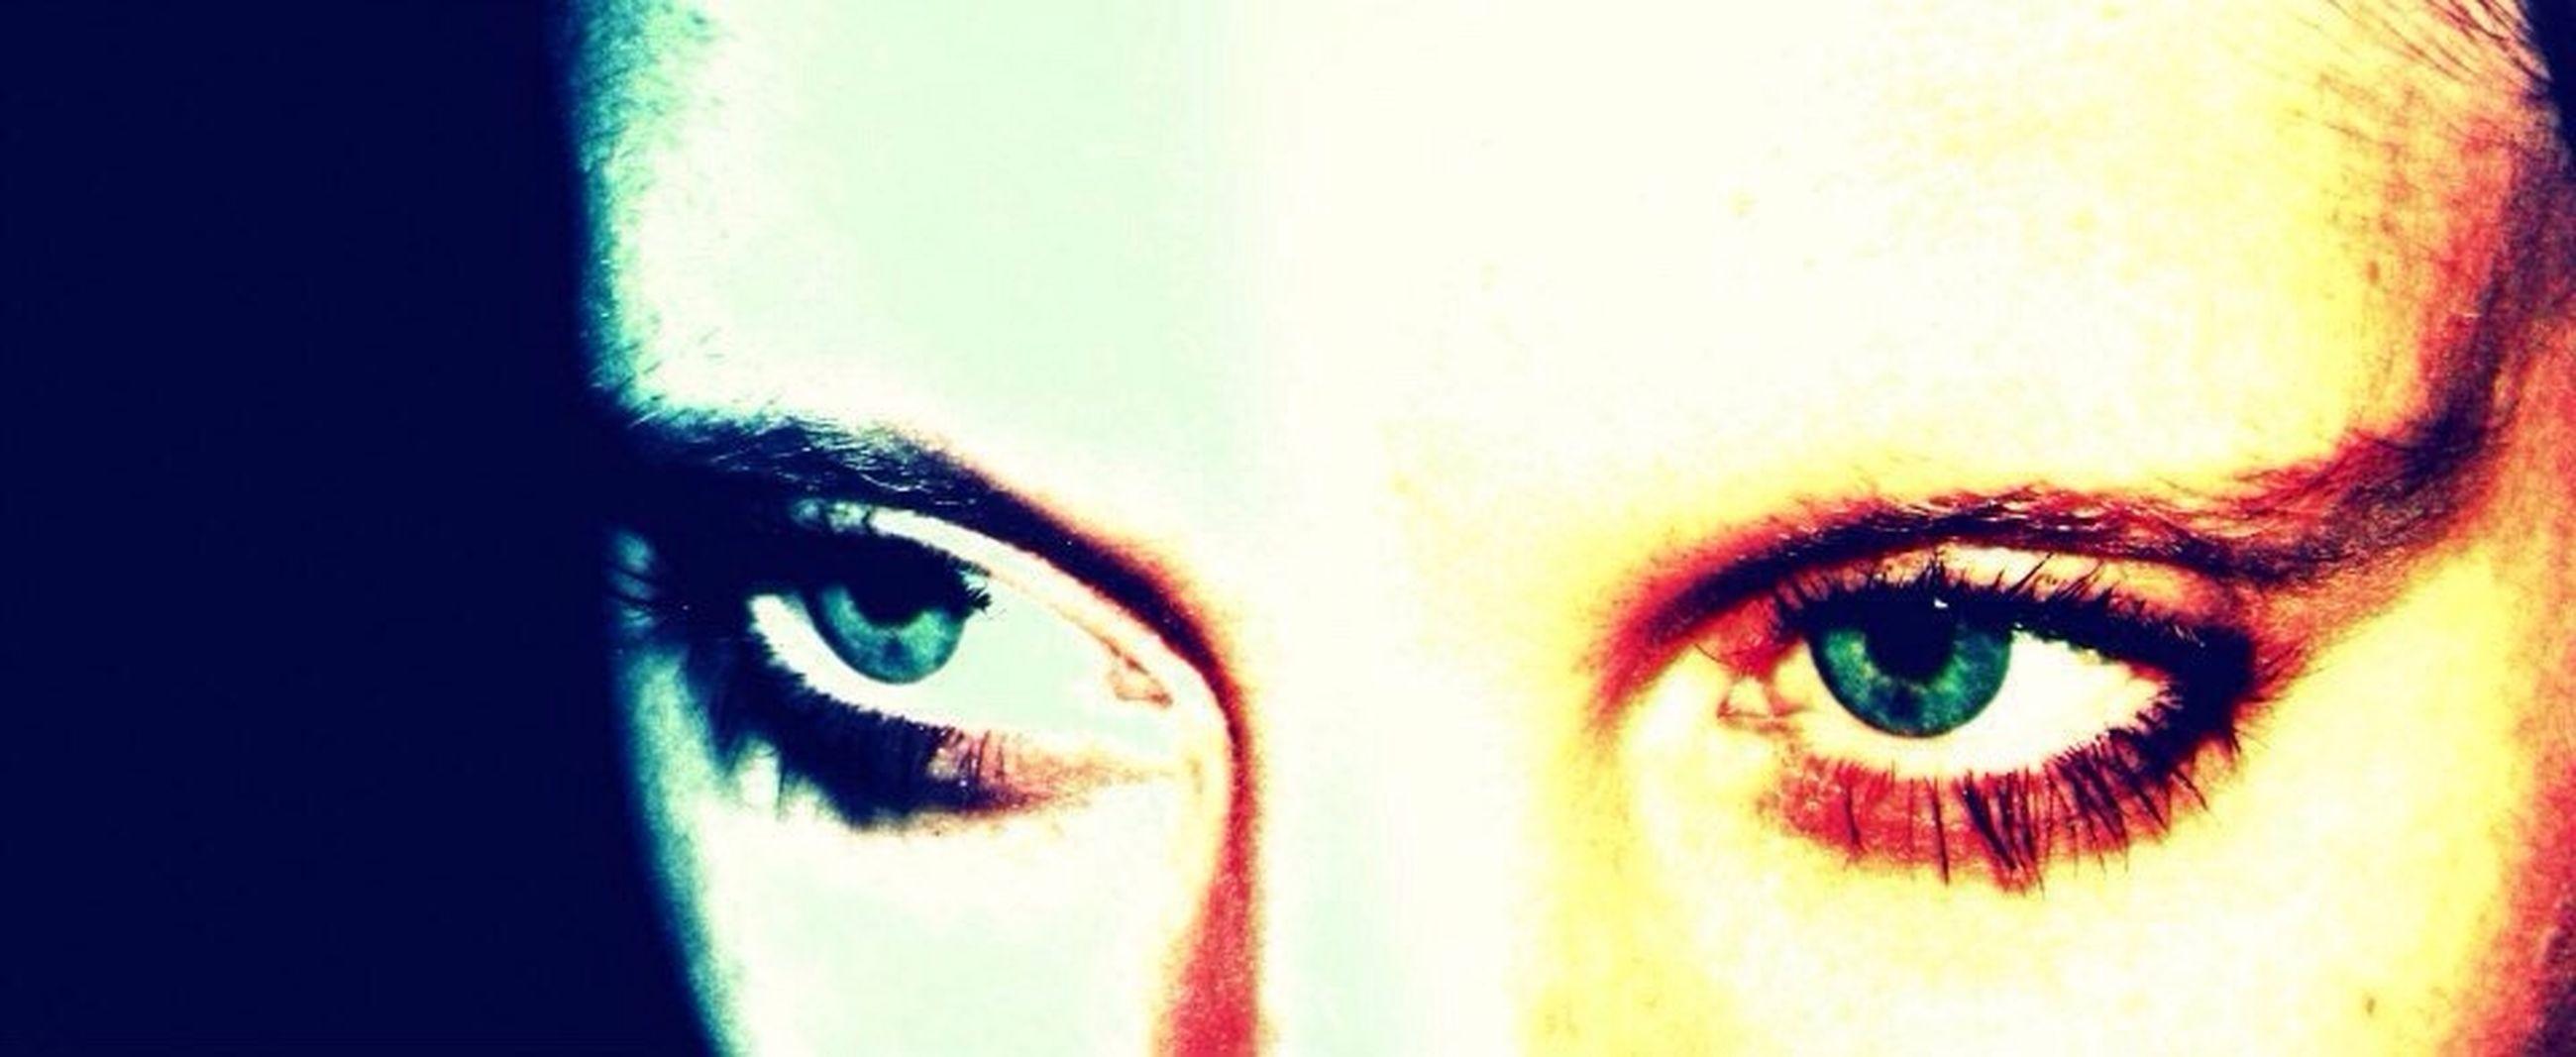 close-up, human eye, portrait, headshot, human face, lifestyles, eyelash, leisure activity, part of, human skin, staring, extreme close-up, focus on foreground, detail, extreme close up